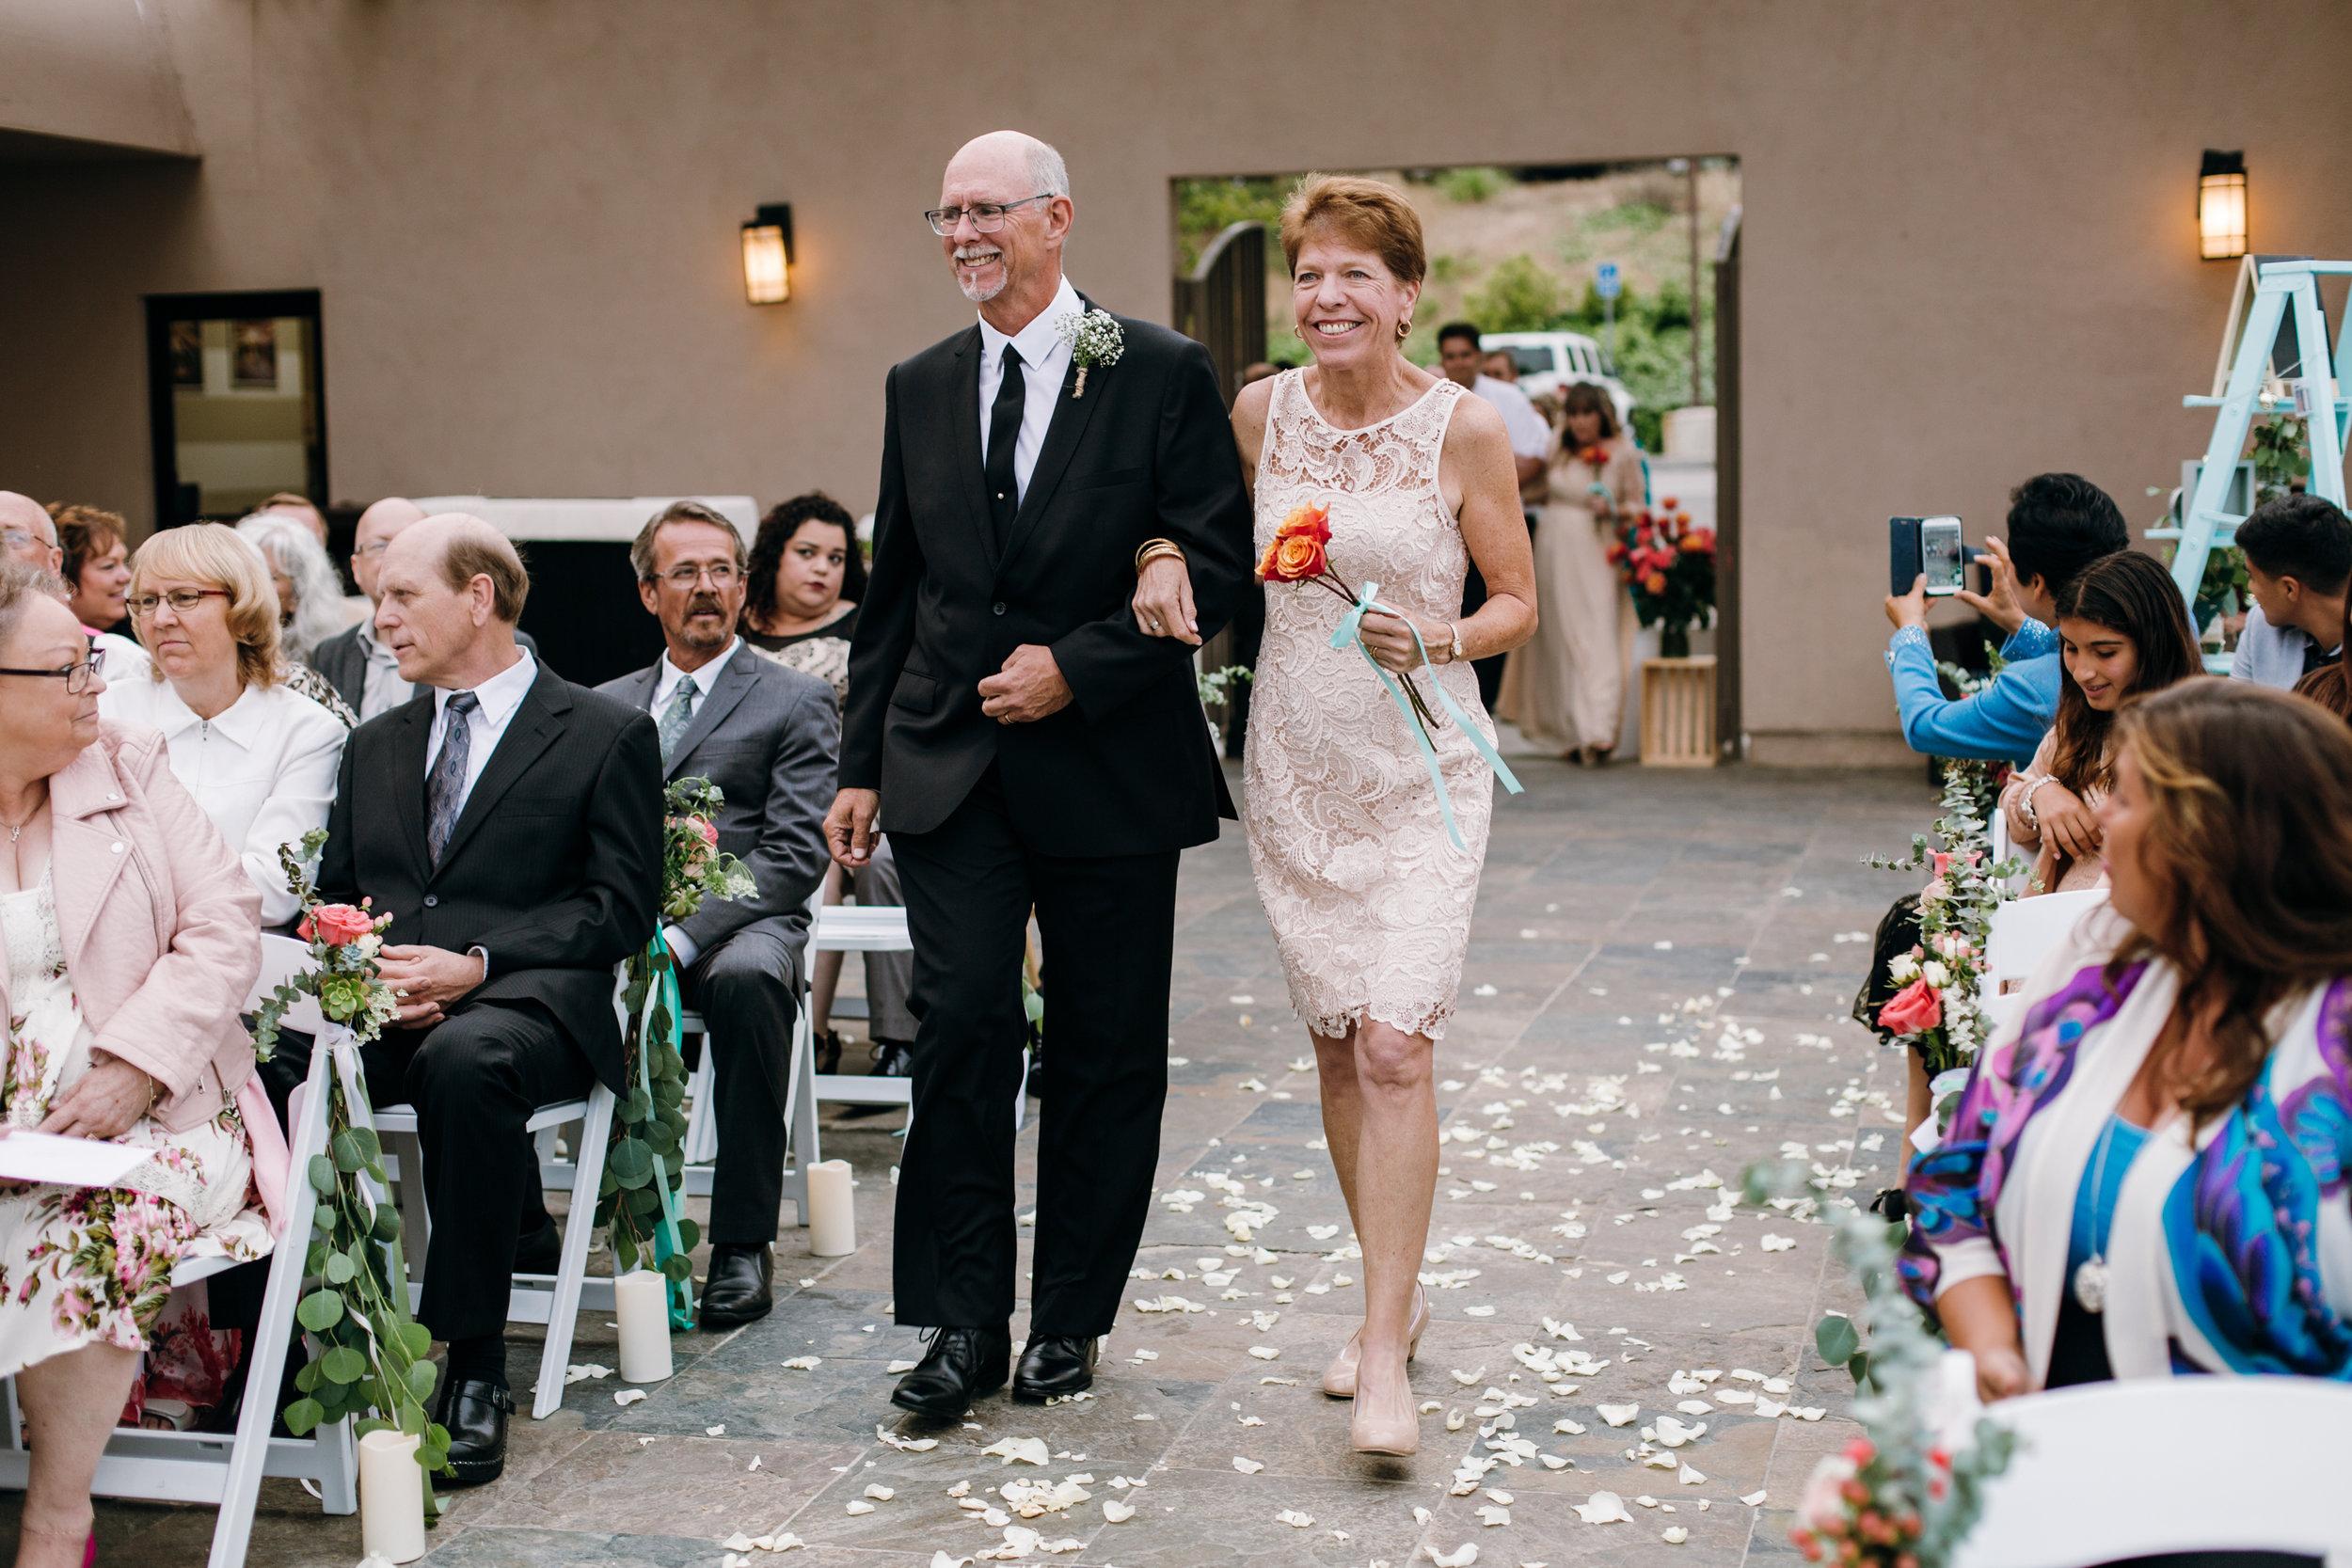 KaraNixonWeddings-PalosVerdes-Wedding-24.jpg